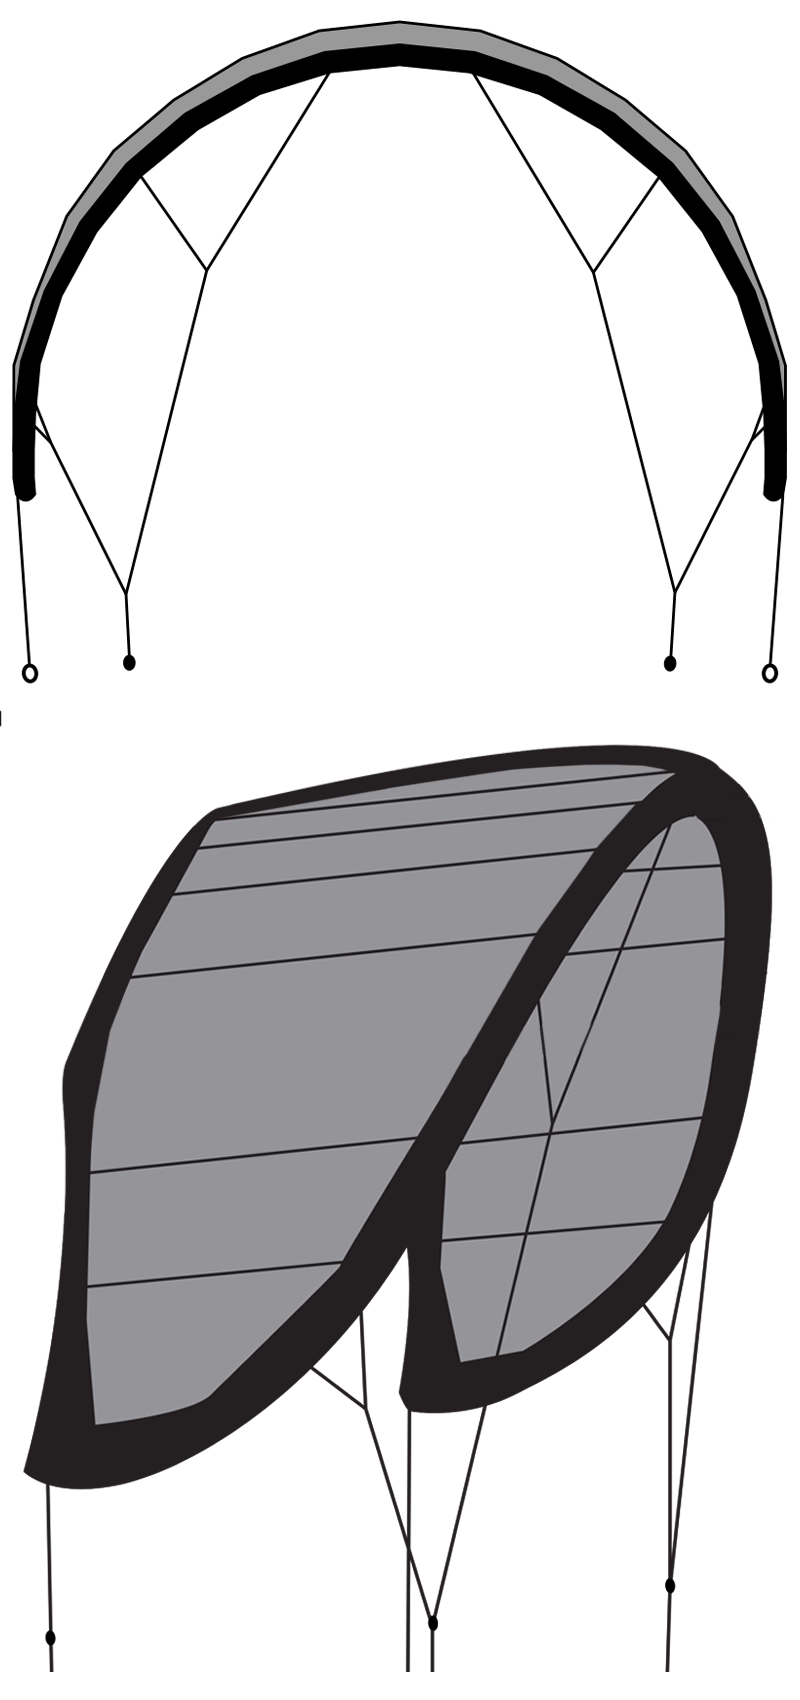 1 aile de kitesurf 1 latte shape design